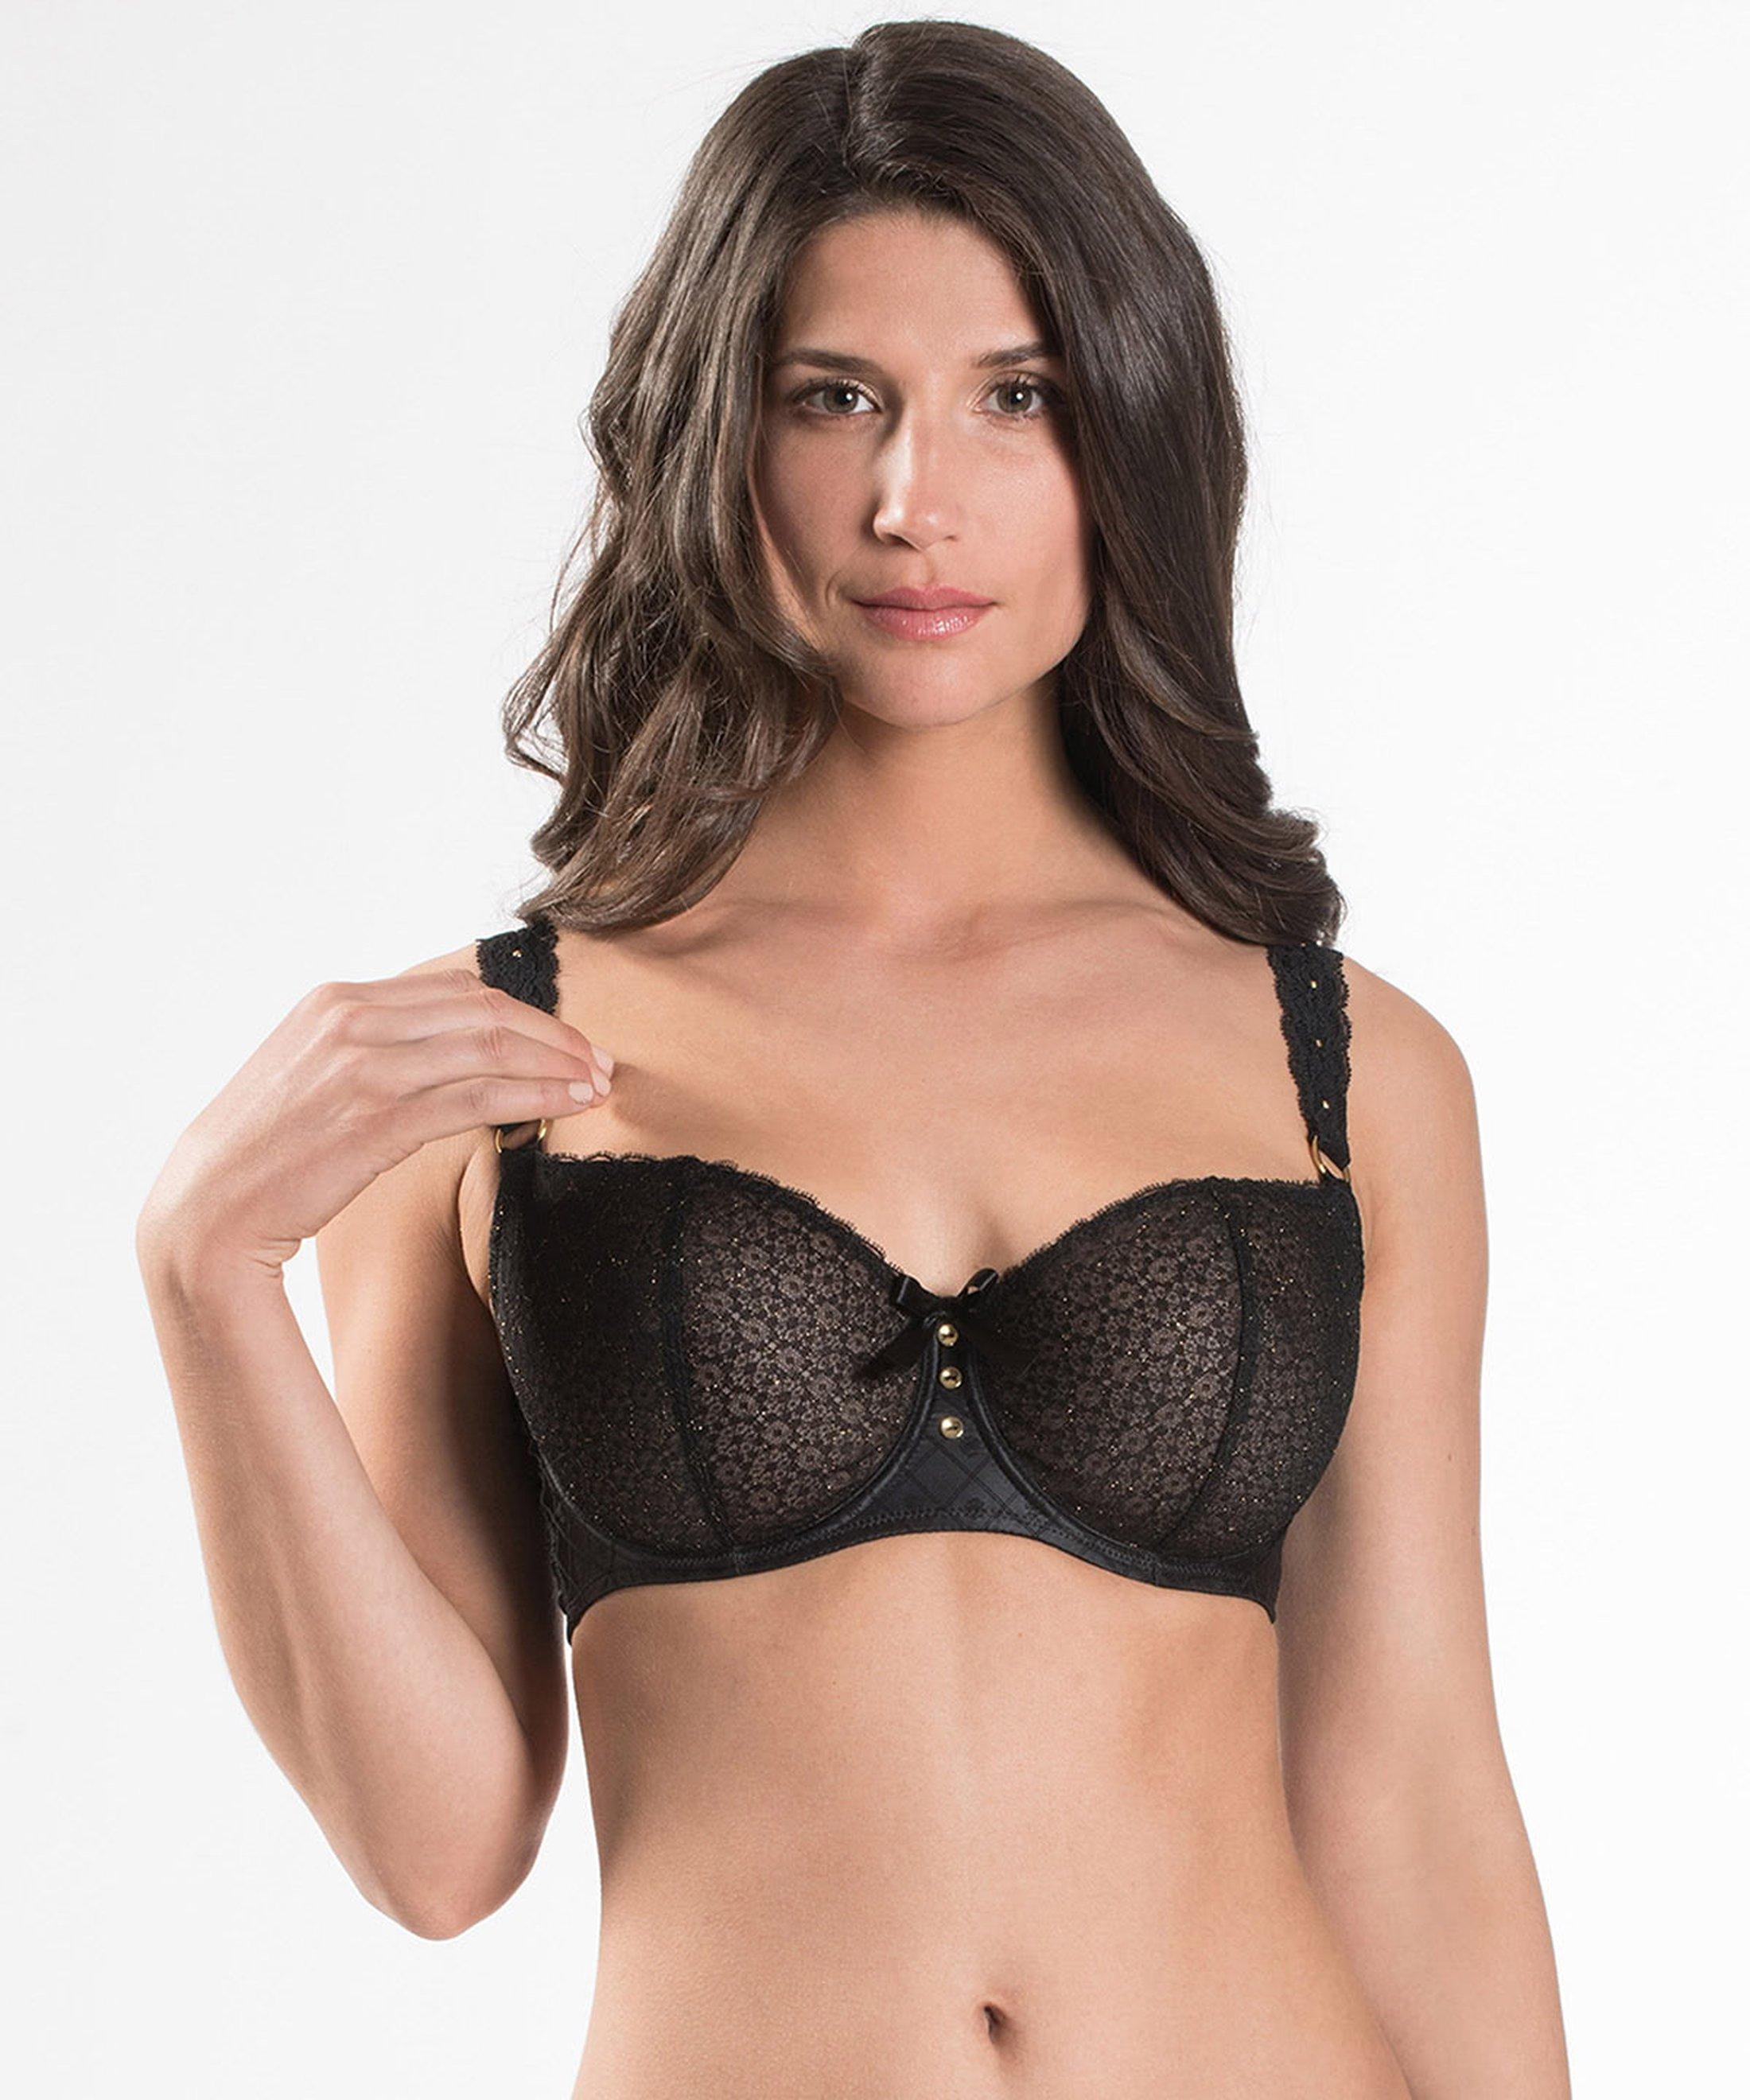 FEMME AUBADE Comfort Half cup bra Black | Aubade